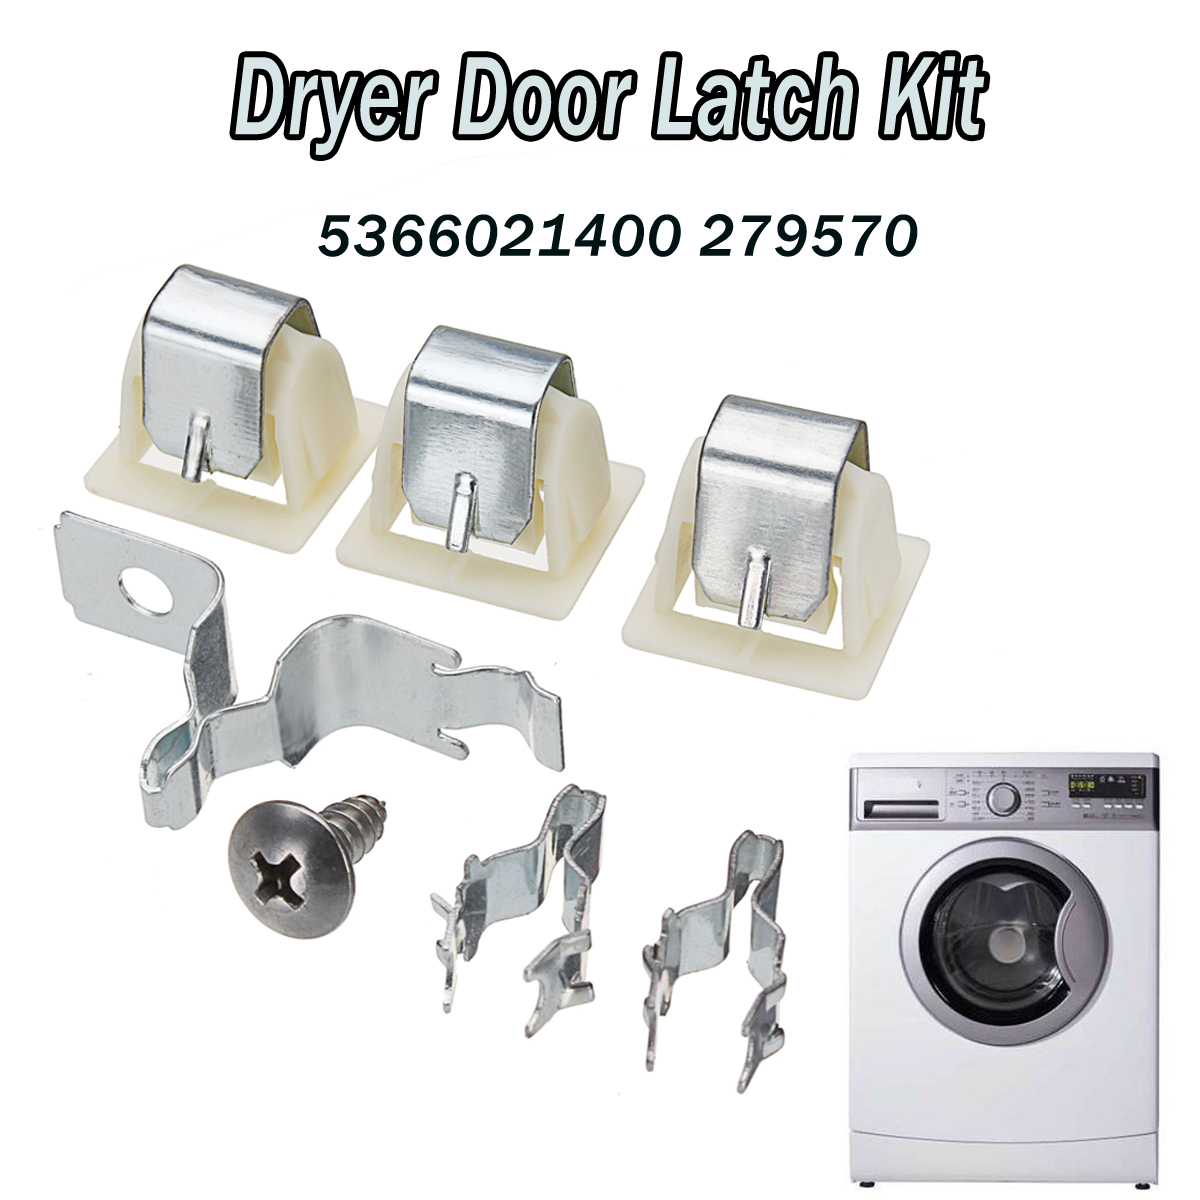 Dryer Door Latch Kit Part For Electrolux Frigidaire  5366021400 279570